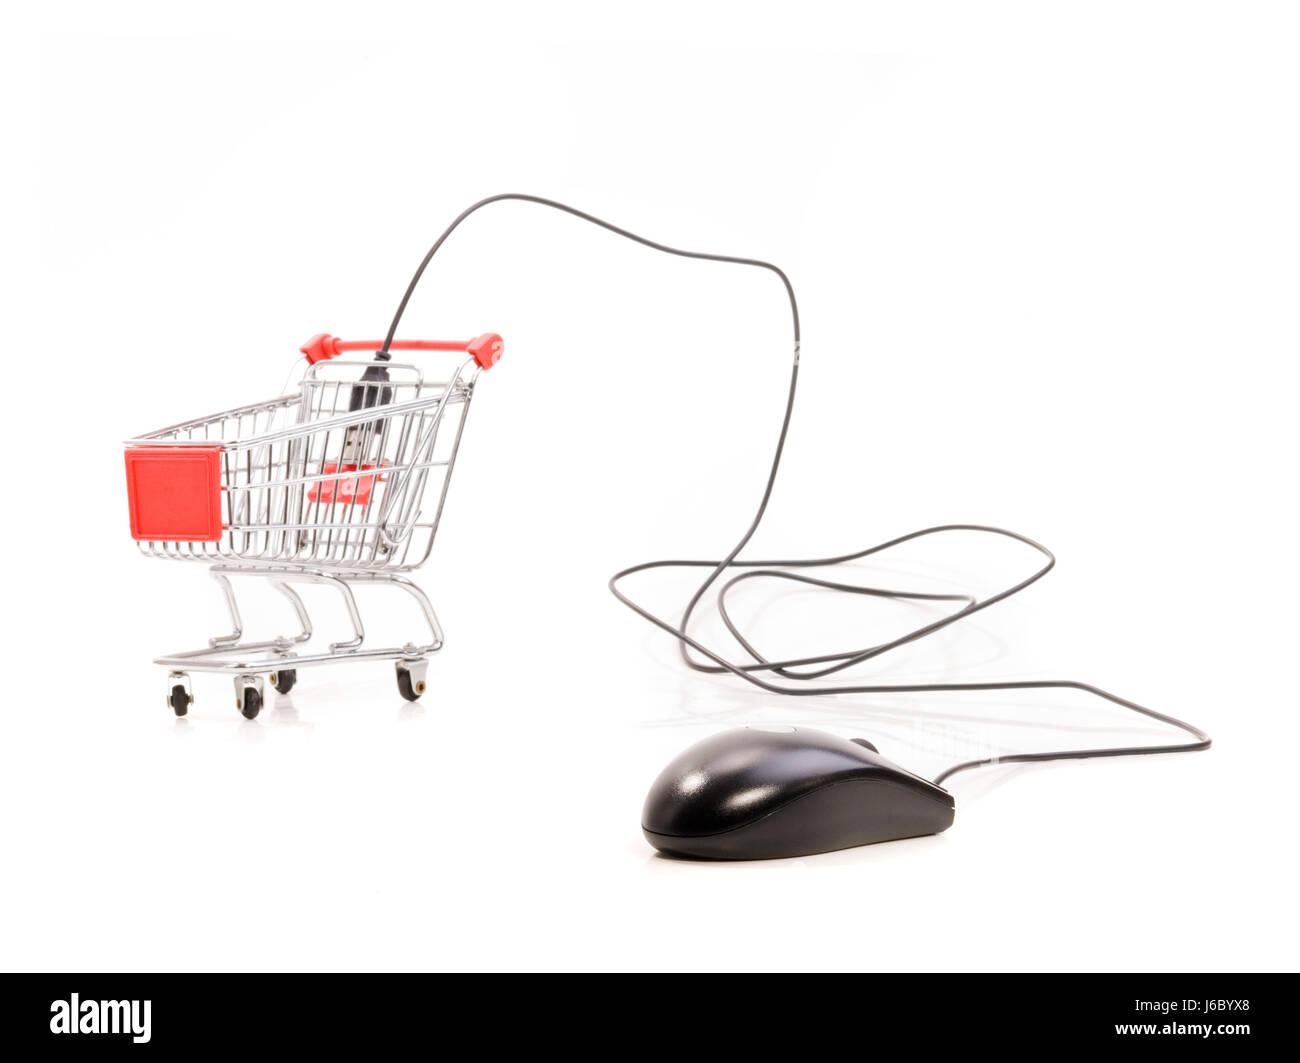 shopping buy trolley cart purchase online shop webshop web shop onlineshop - Stock Image